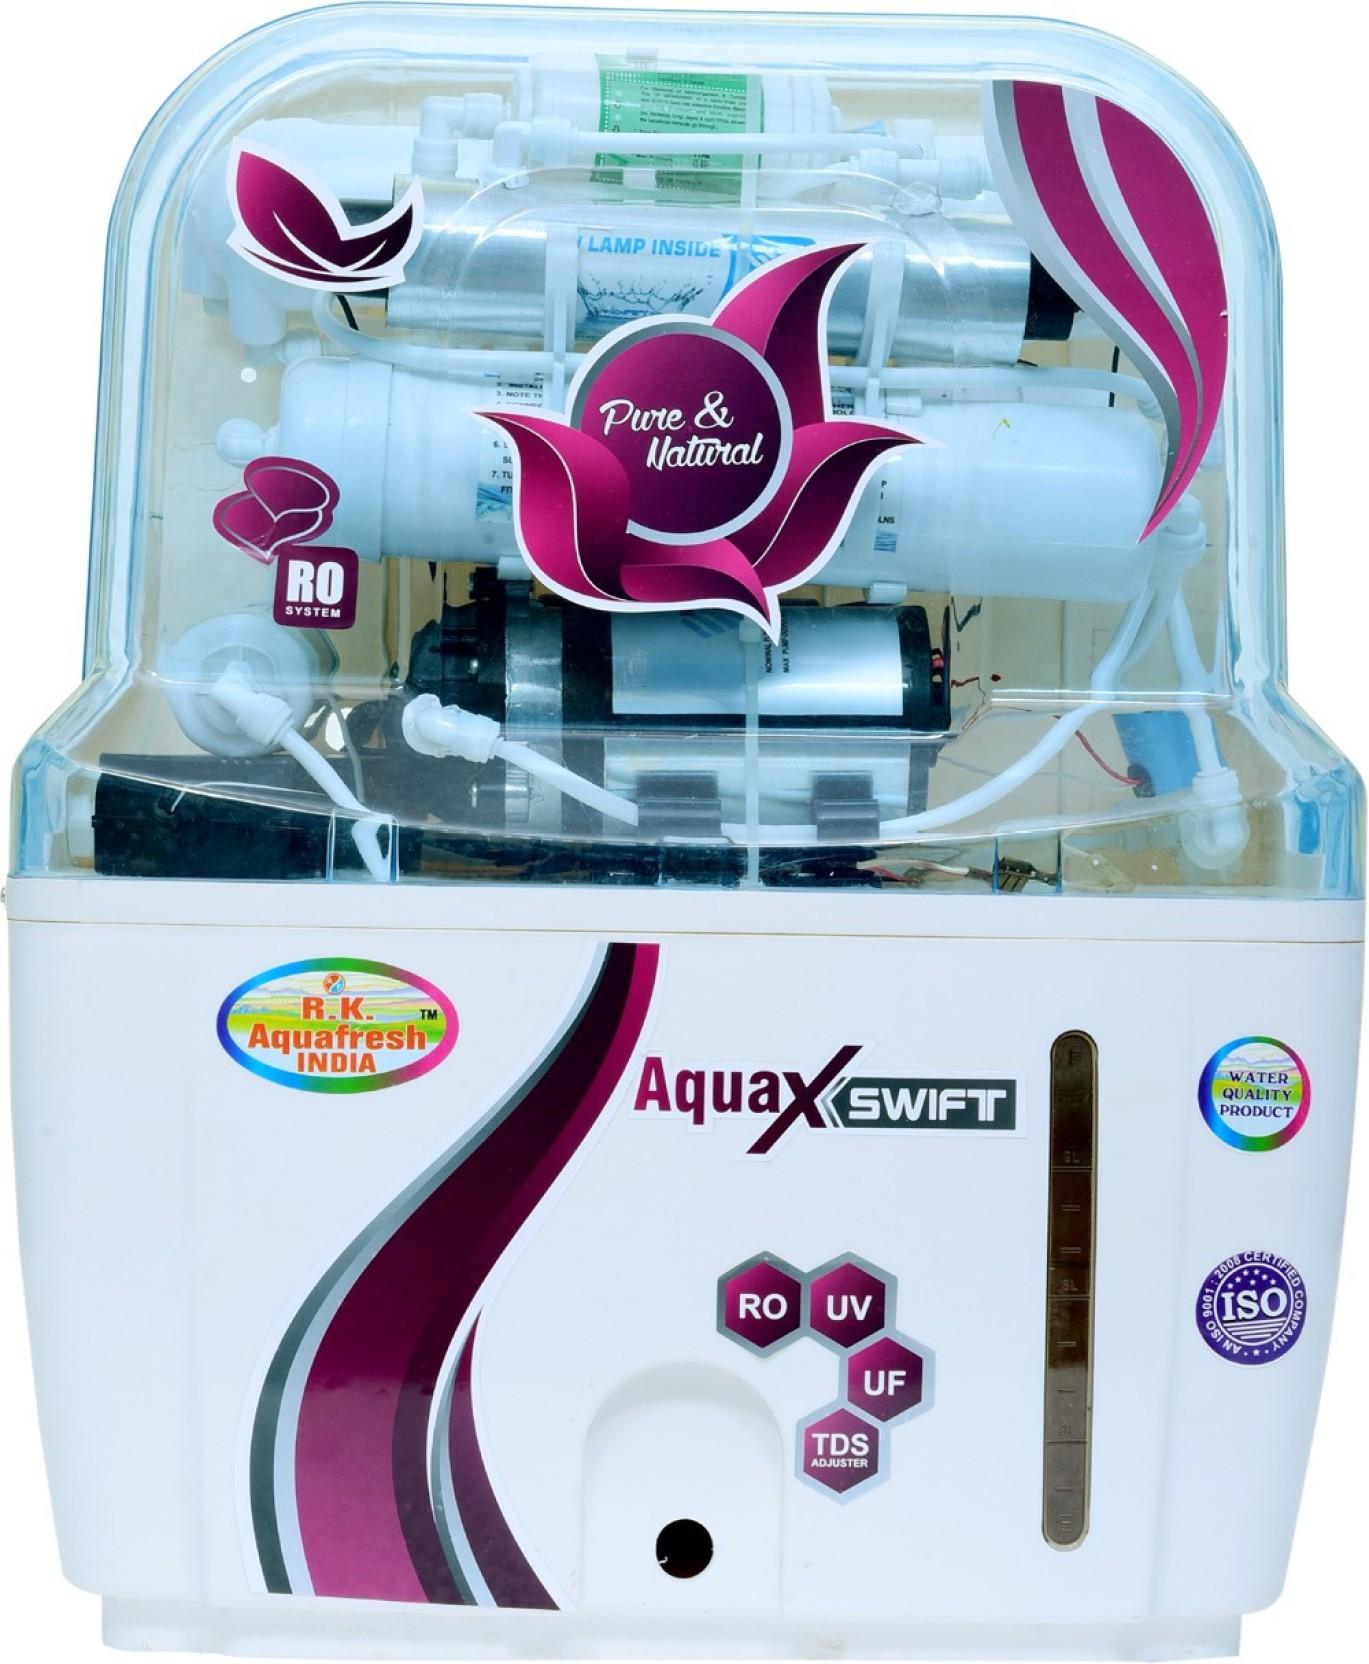 Rk Aquafresh India ZX14STAGE 12 L RO + UV +UF Water Purifier - Rk ...